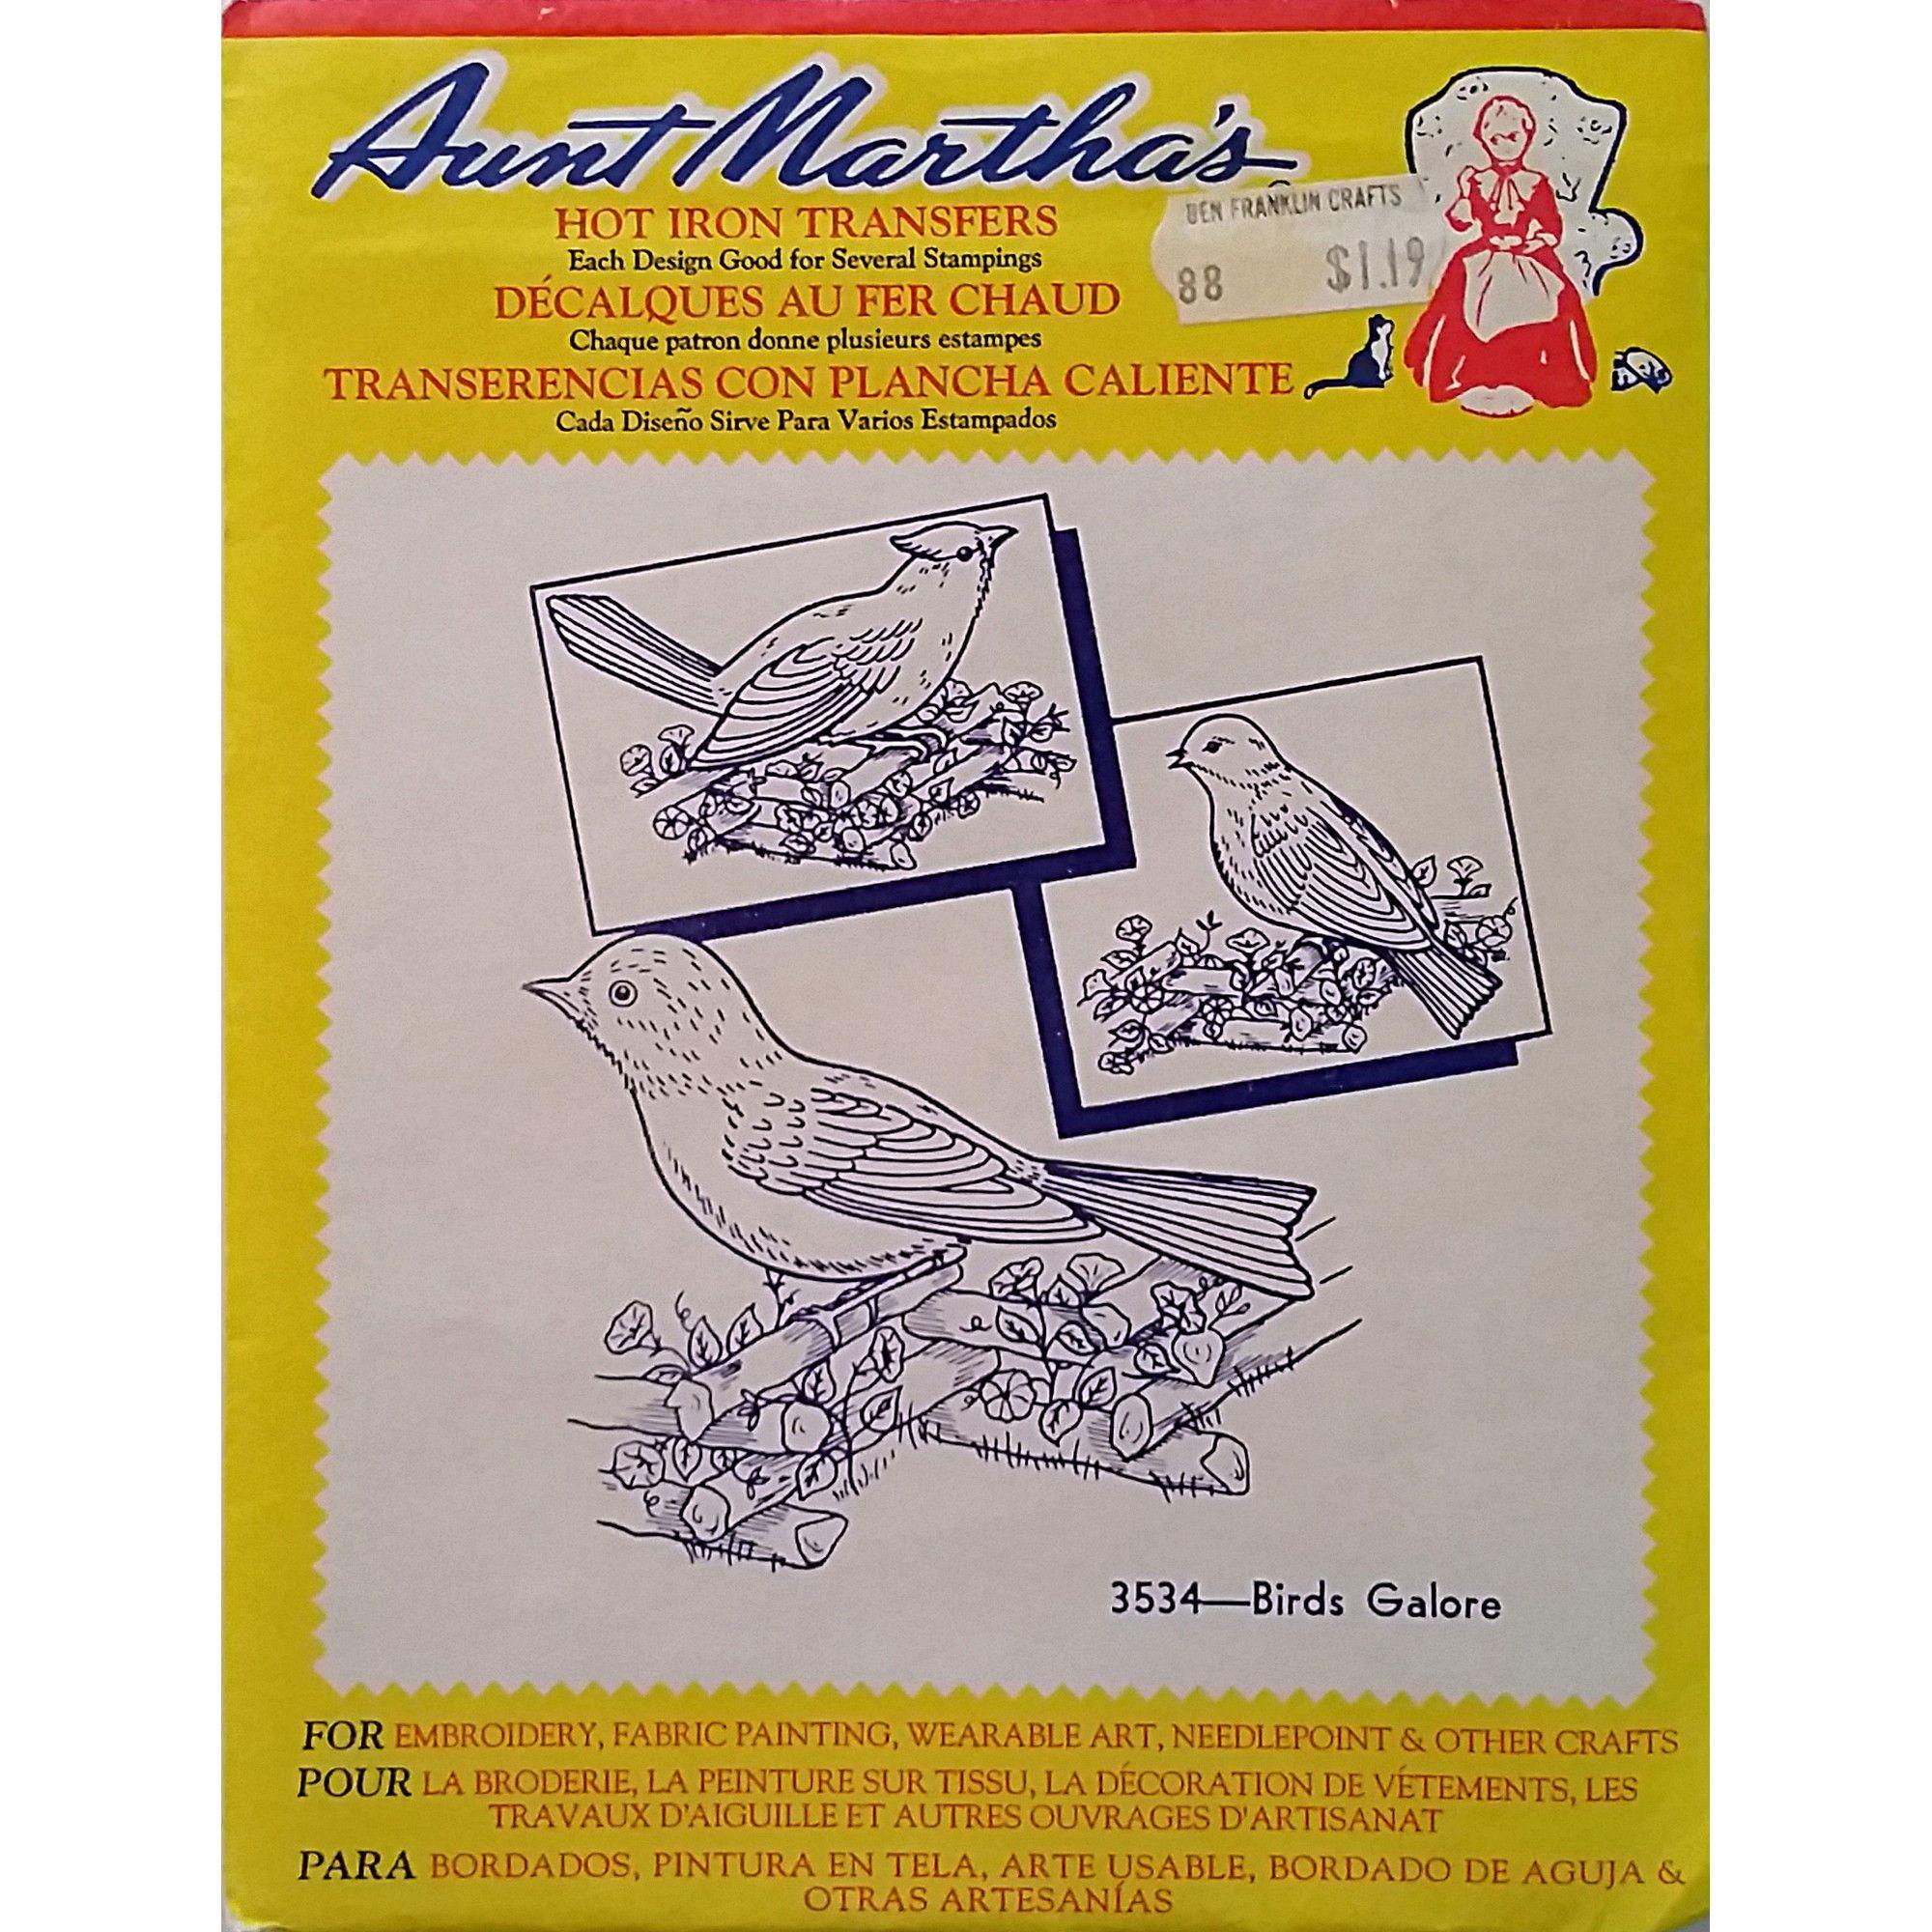 Birds galore aunt marthas vintage hot iron transfer needlework